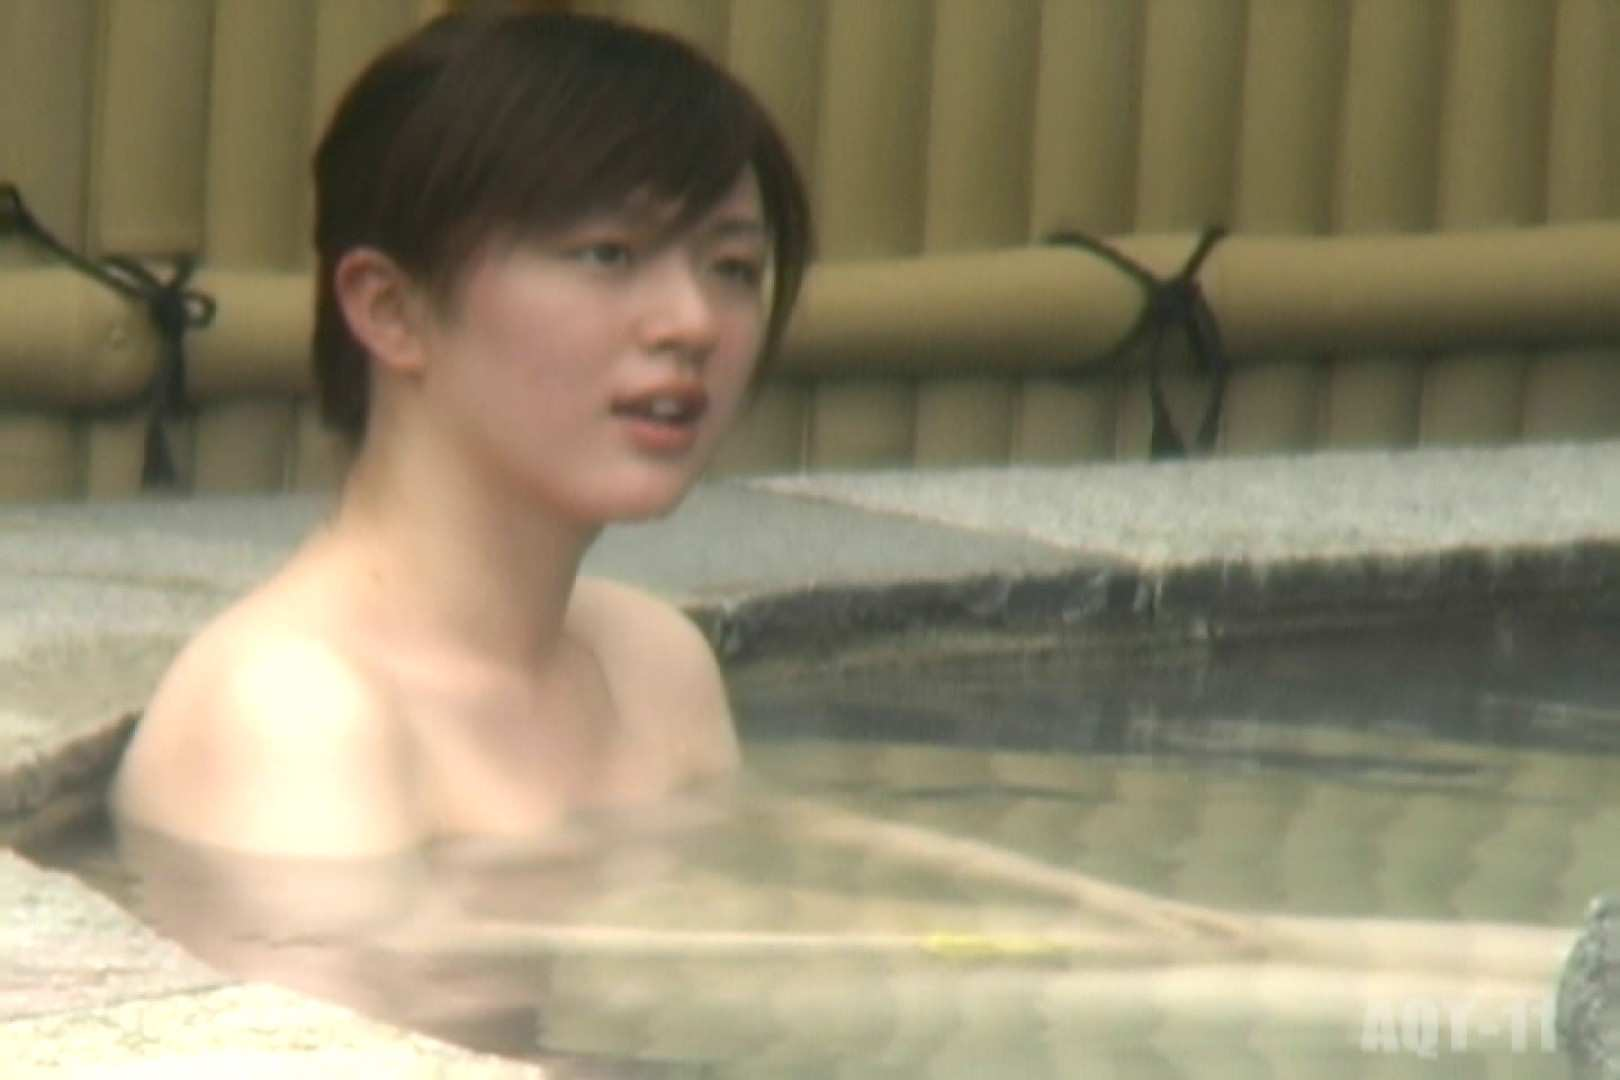 Aquaな露天風呂Vol.797 露天 覗きワレメ動画紹介 67連発 44